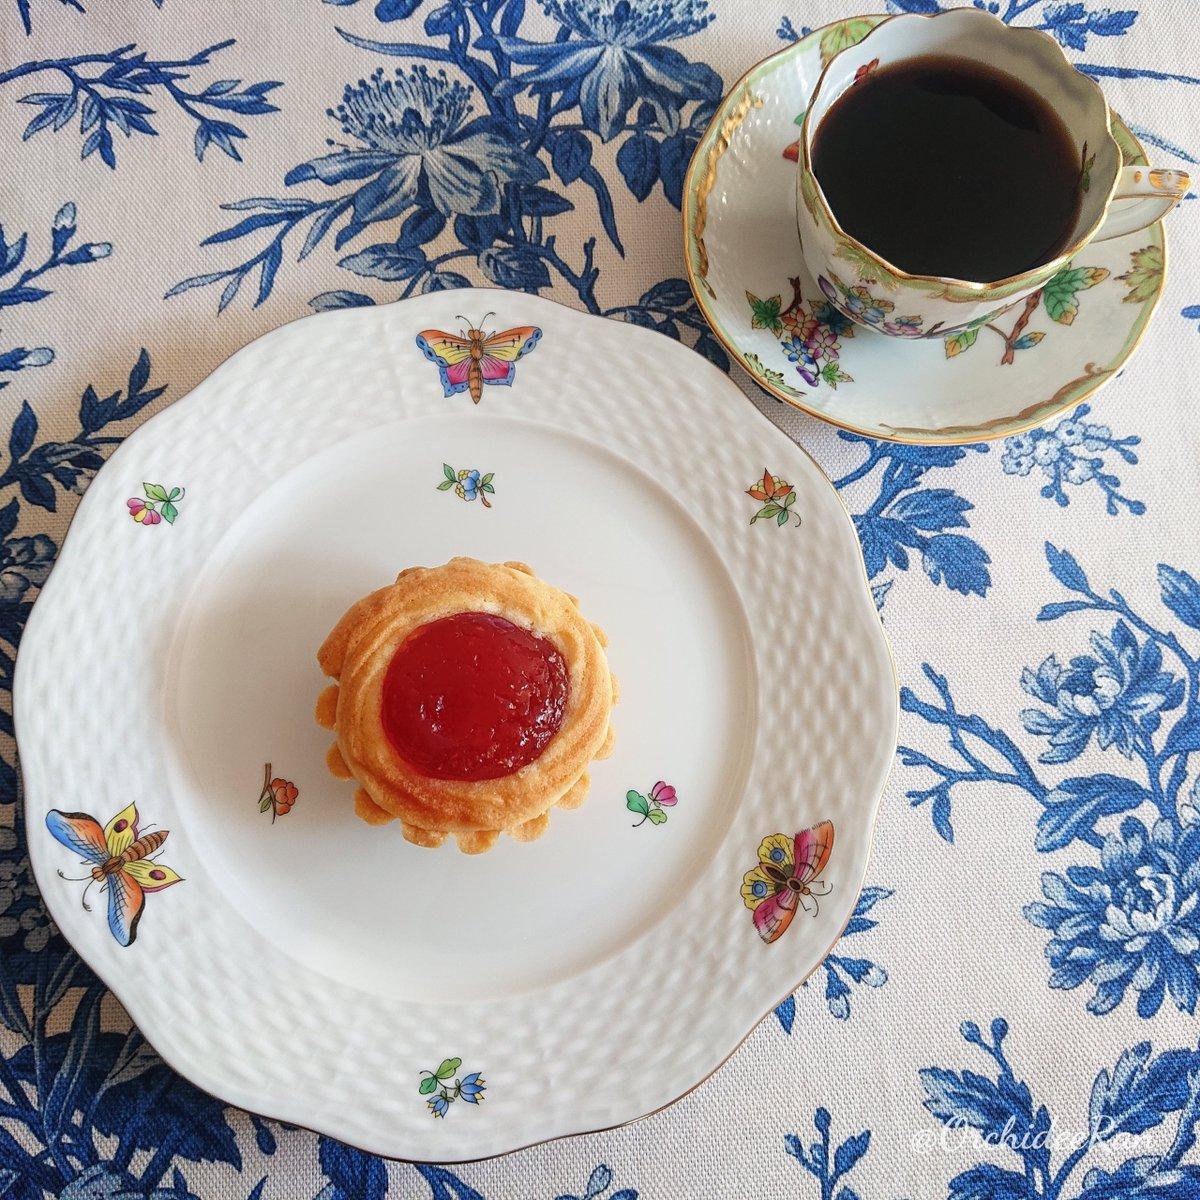 test ツイッターメディア - ヴィクトリアを愉しむ #おうちカフェ   ❥お菓子 銀座ウエスト「ヴィクトリア」  ウエストのドライケーキの中で一番好き💕  さくっほろっな生地とイチゴジャムが美味  ❥カップ&プレート ヘレンド ヴィクトリアシリーズ  #木漏れ日のお茶会 #銀座ウエスト https://t.co/IdHKYpIN9O